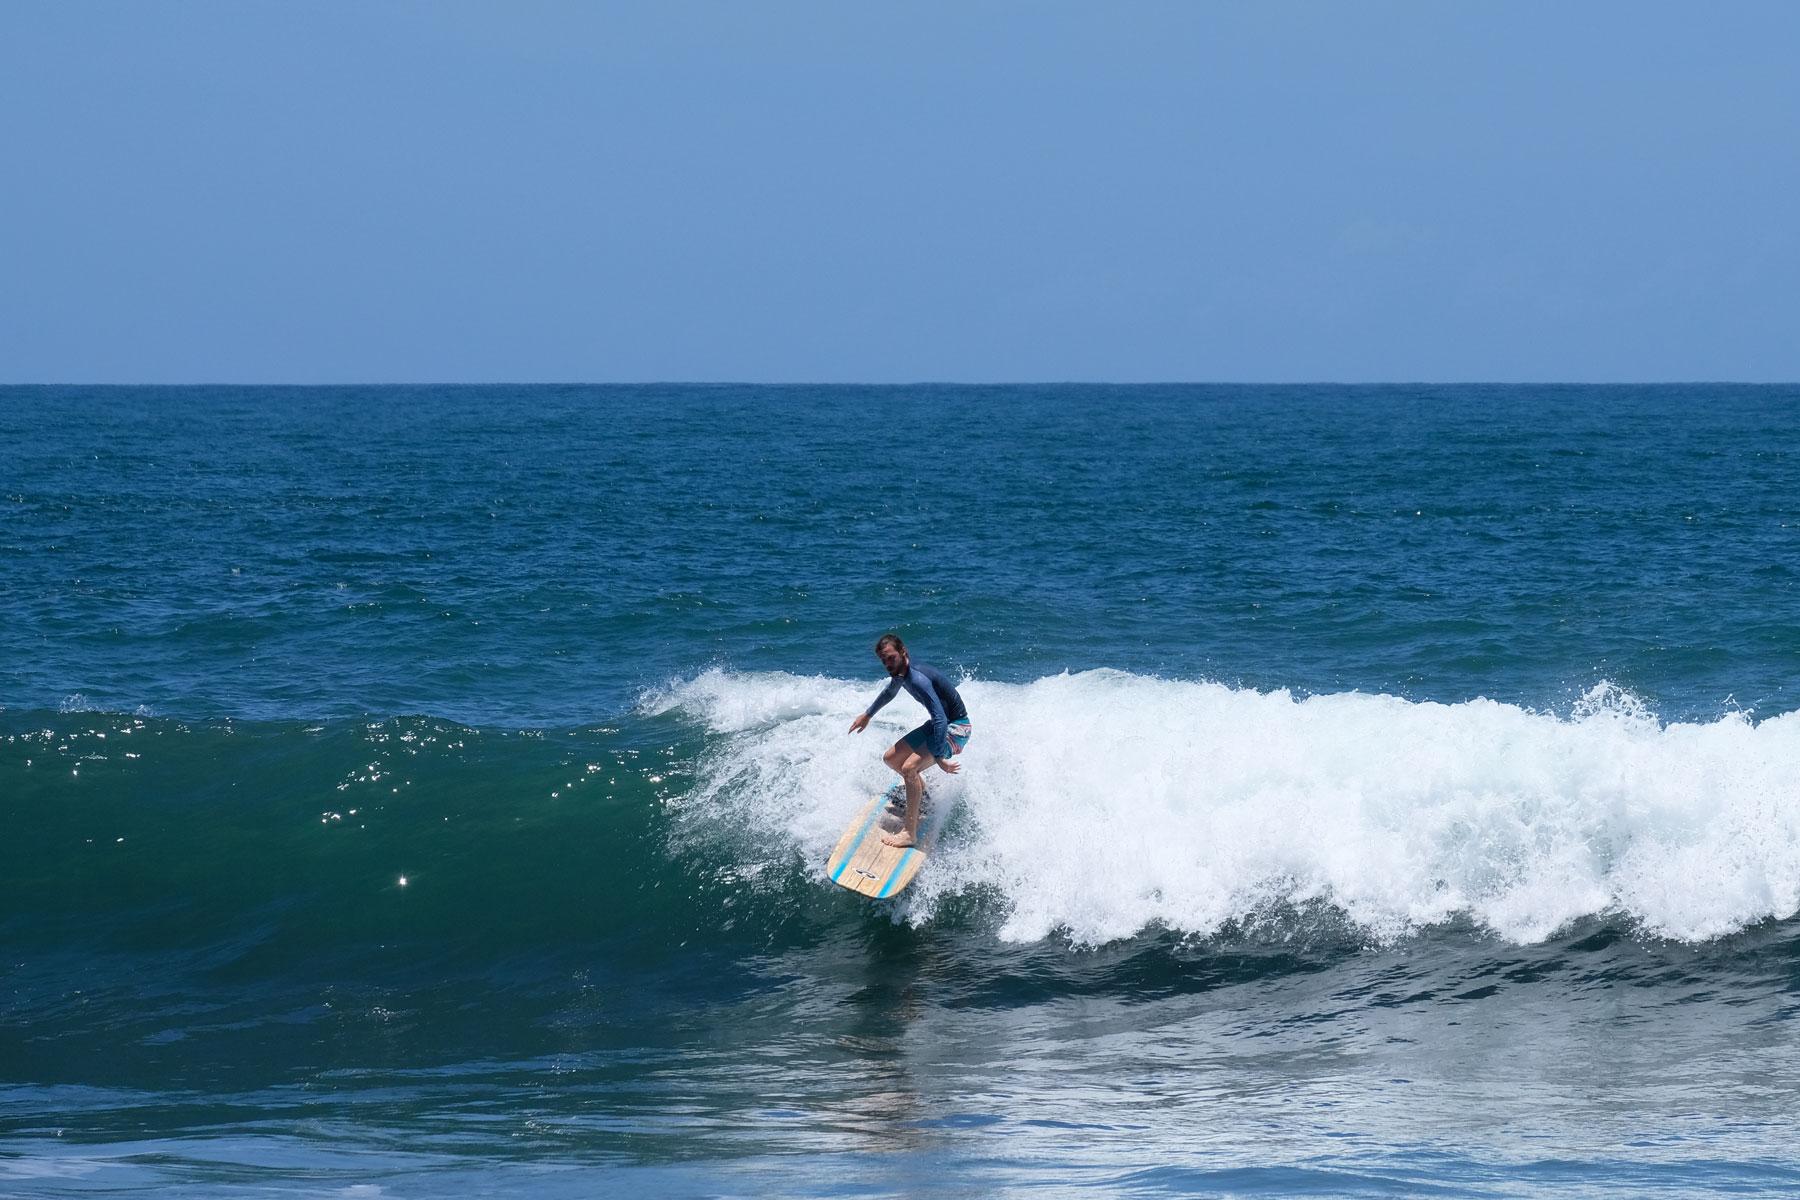 Sebastian surft auf einer Welle in El Salvador.